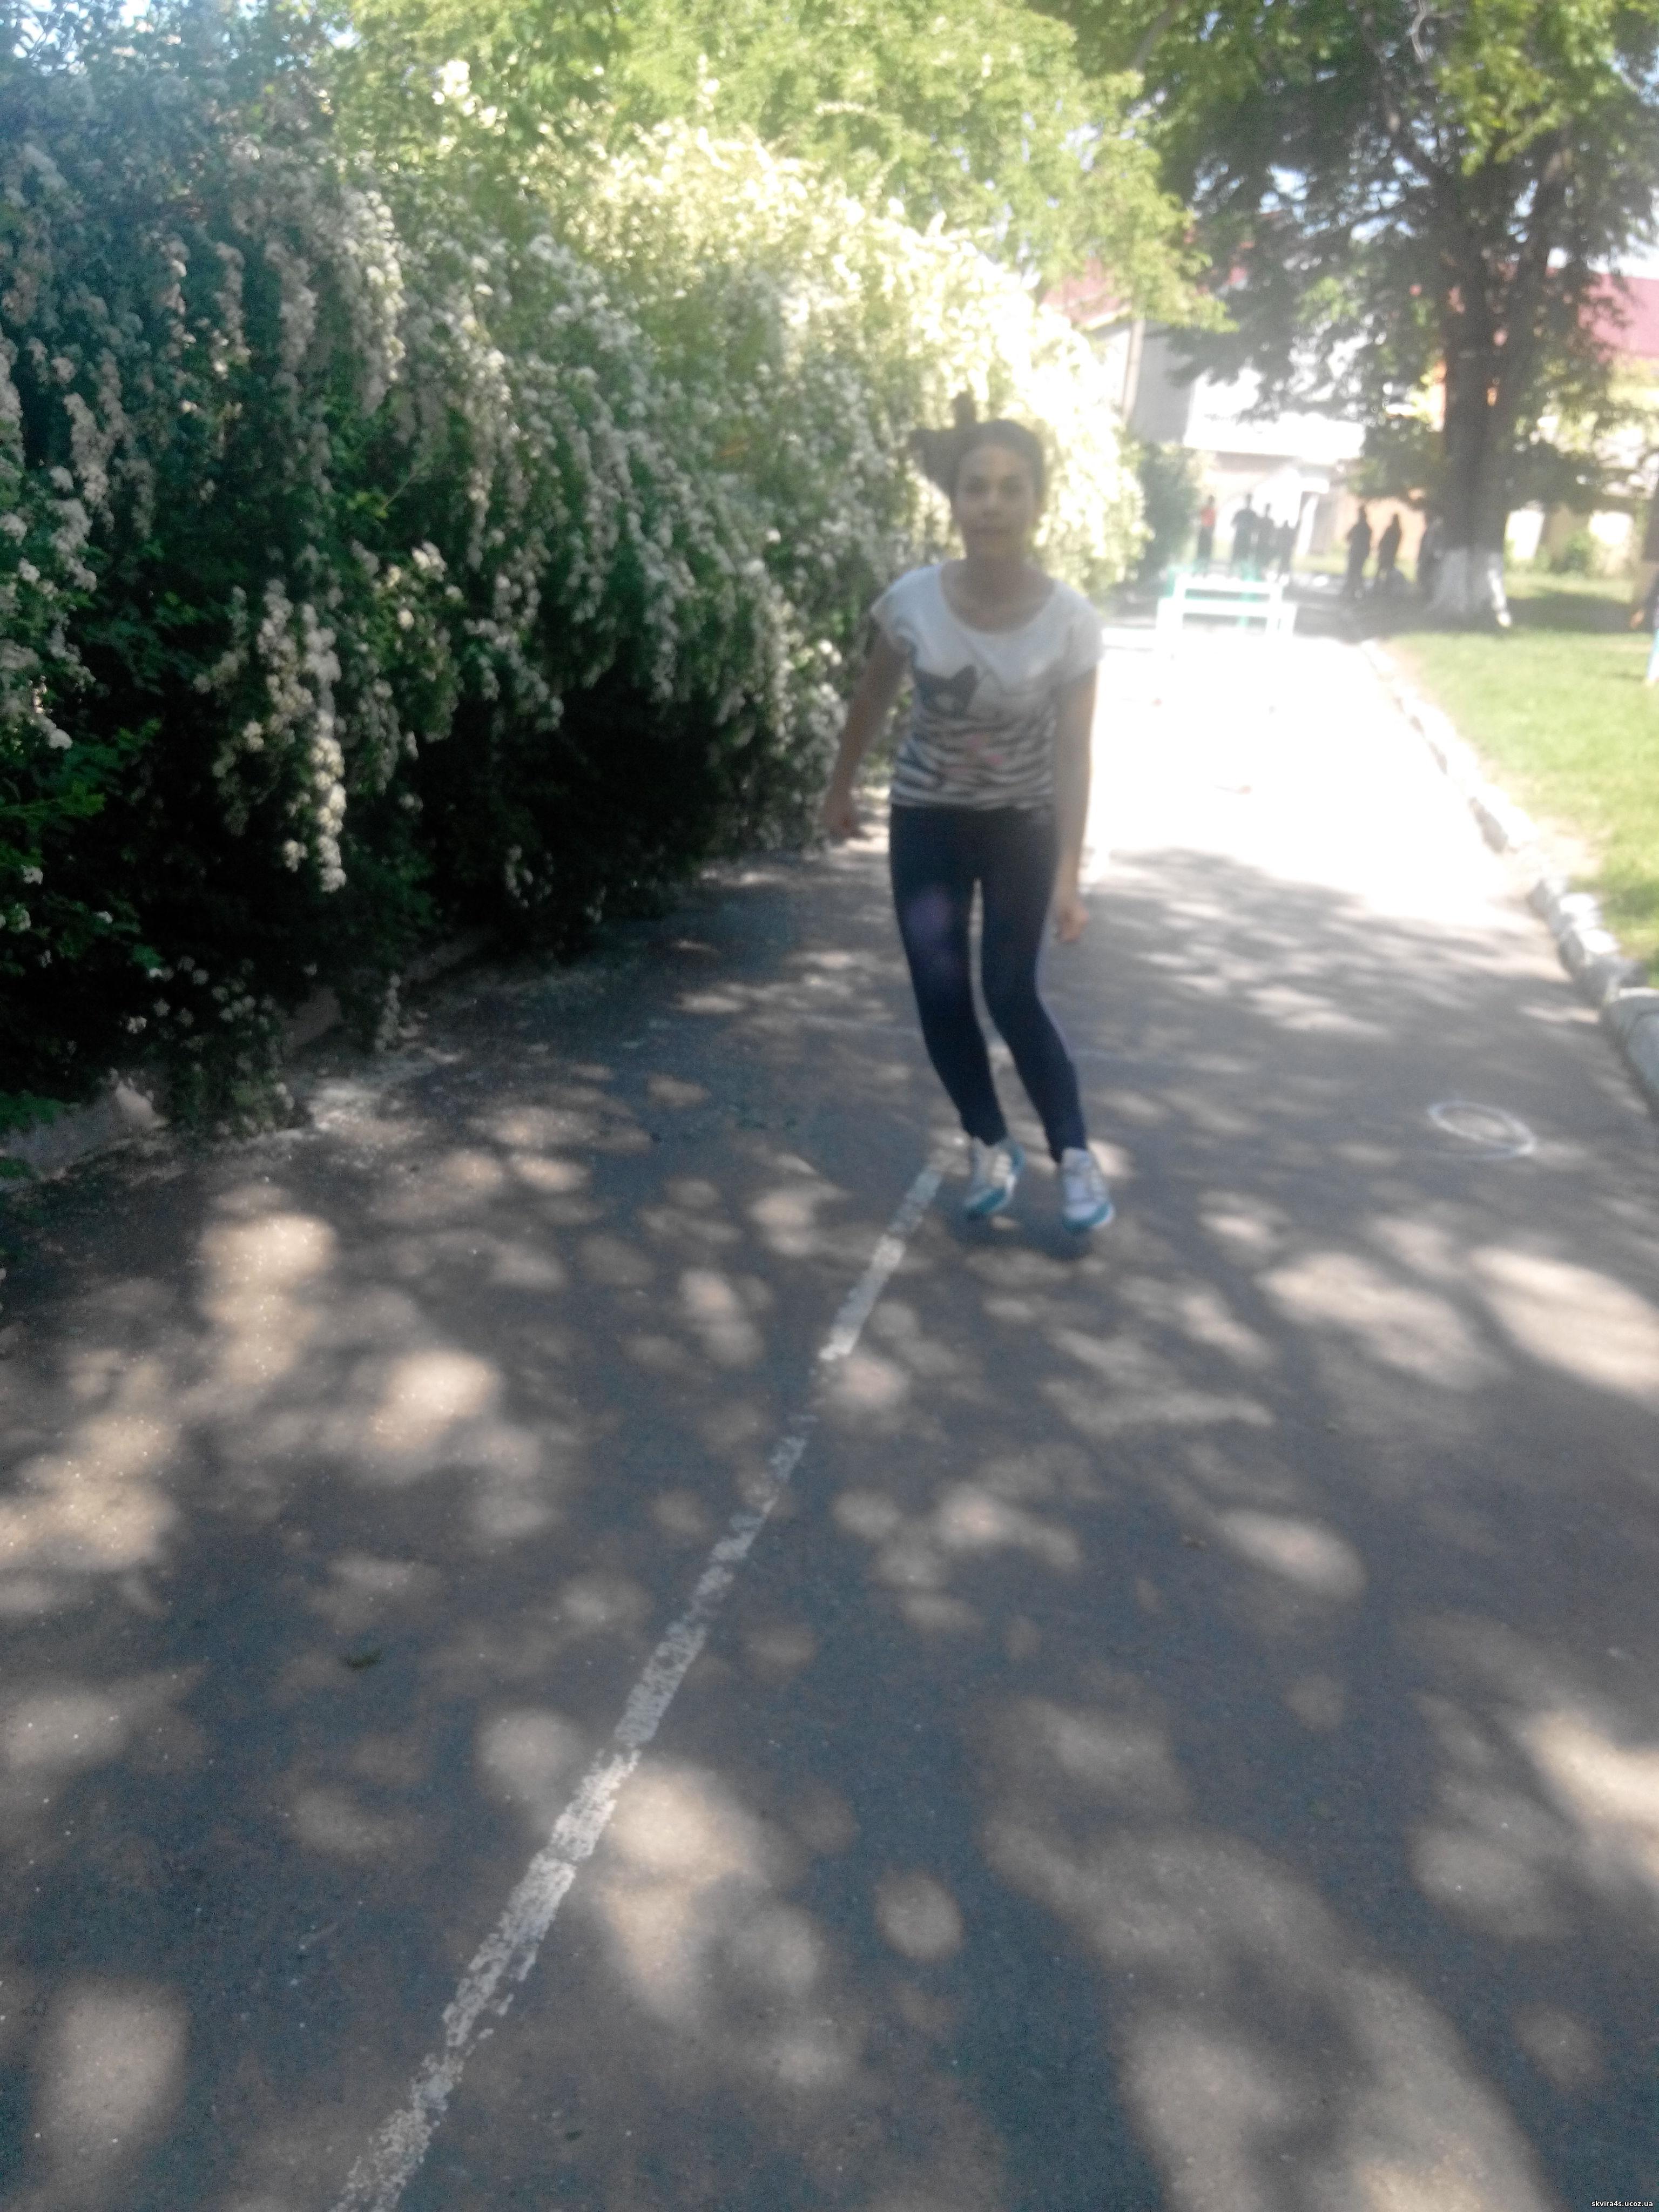 http://skvira4s.ucoz.ua/foto/24-05-17-1/2017524111522.jpg